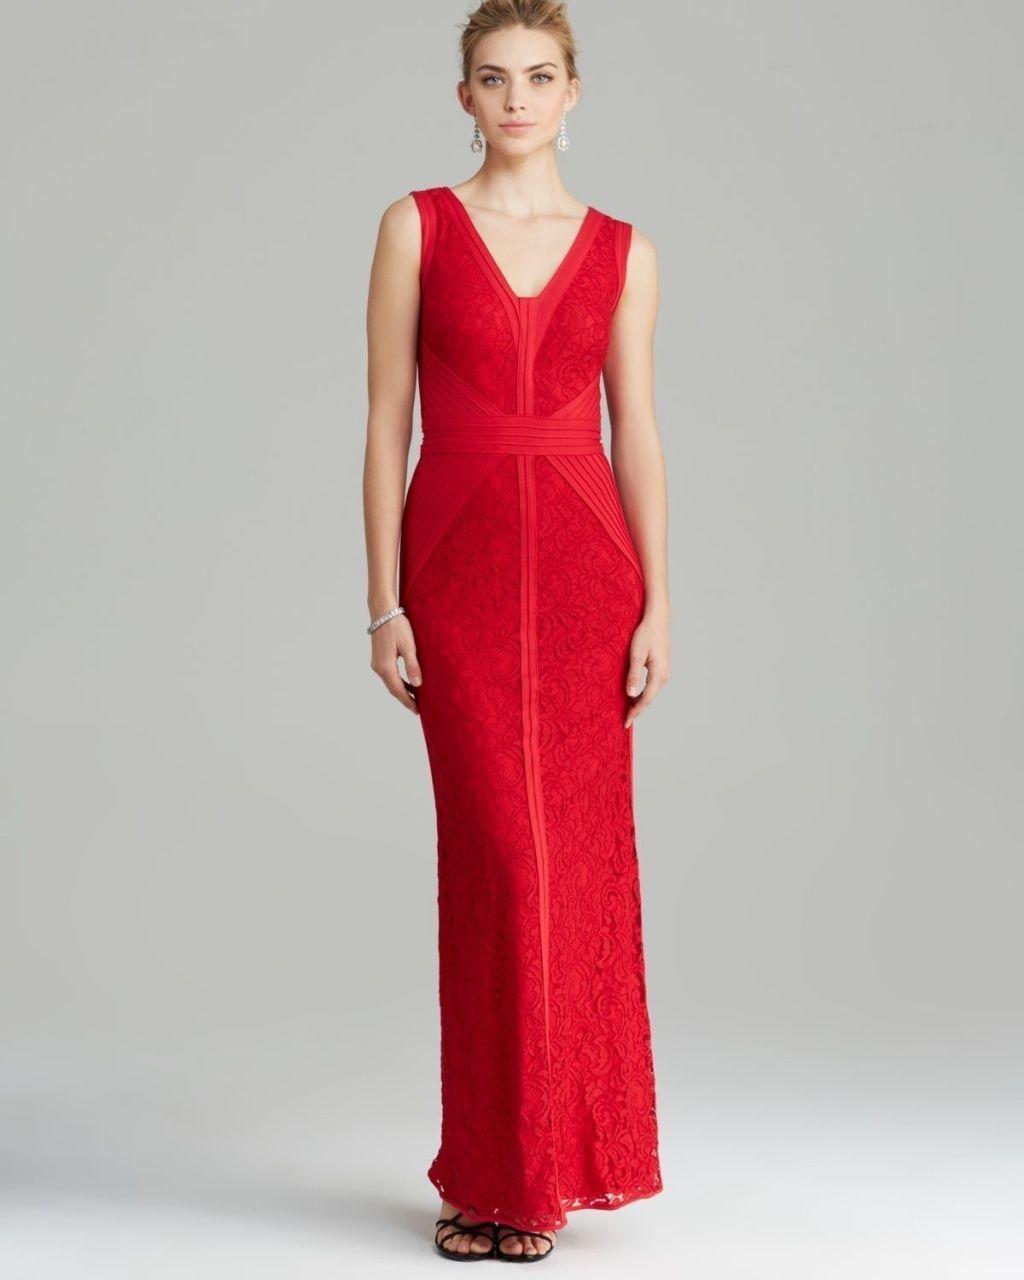 NWT TADASHI SHOJI GORGEOUS WOMENS MAXI GOWN LACE DRESS RED SZ 8  388